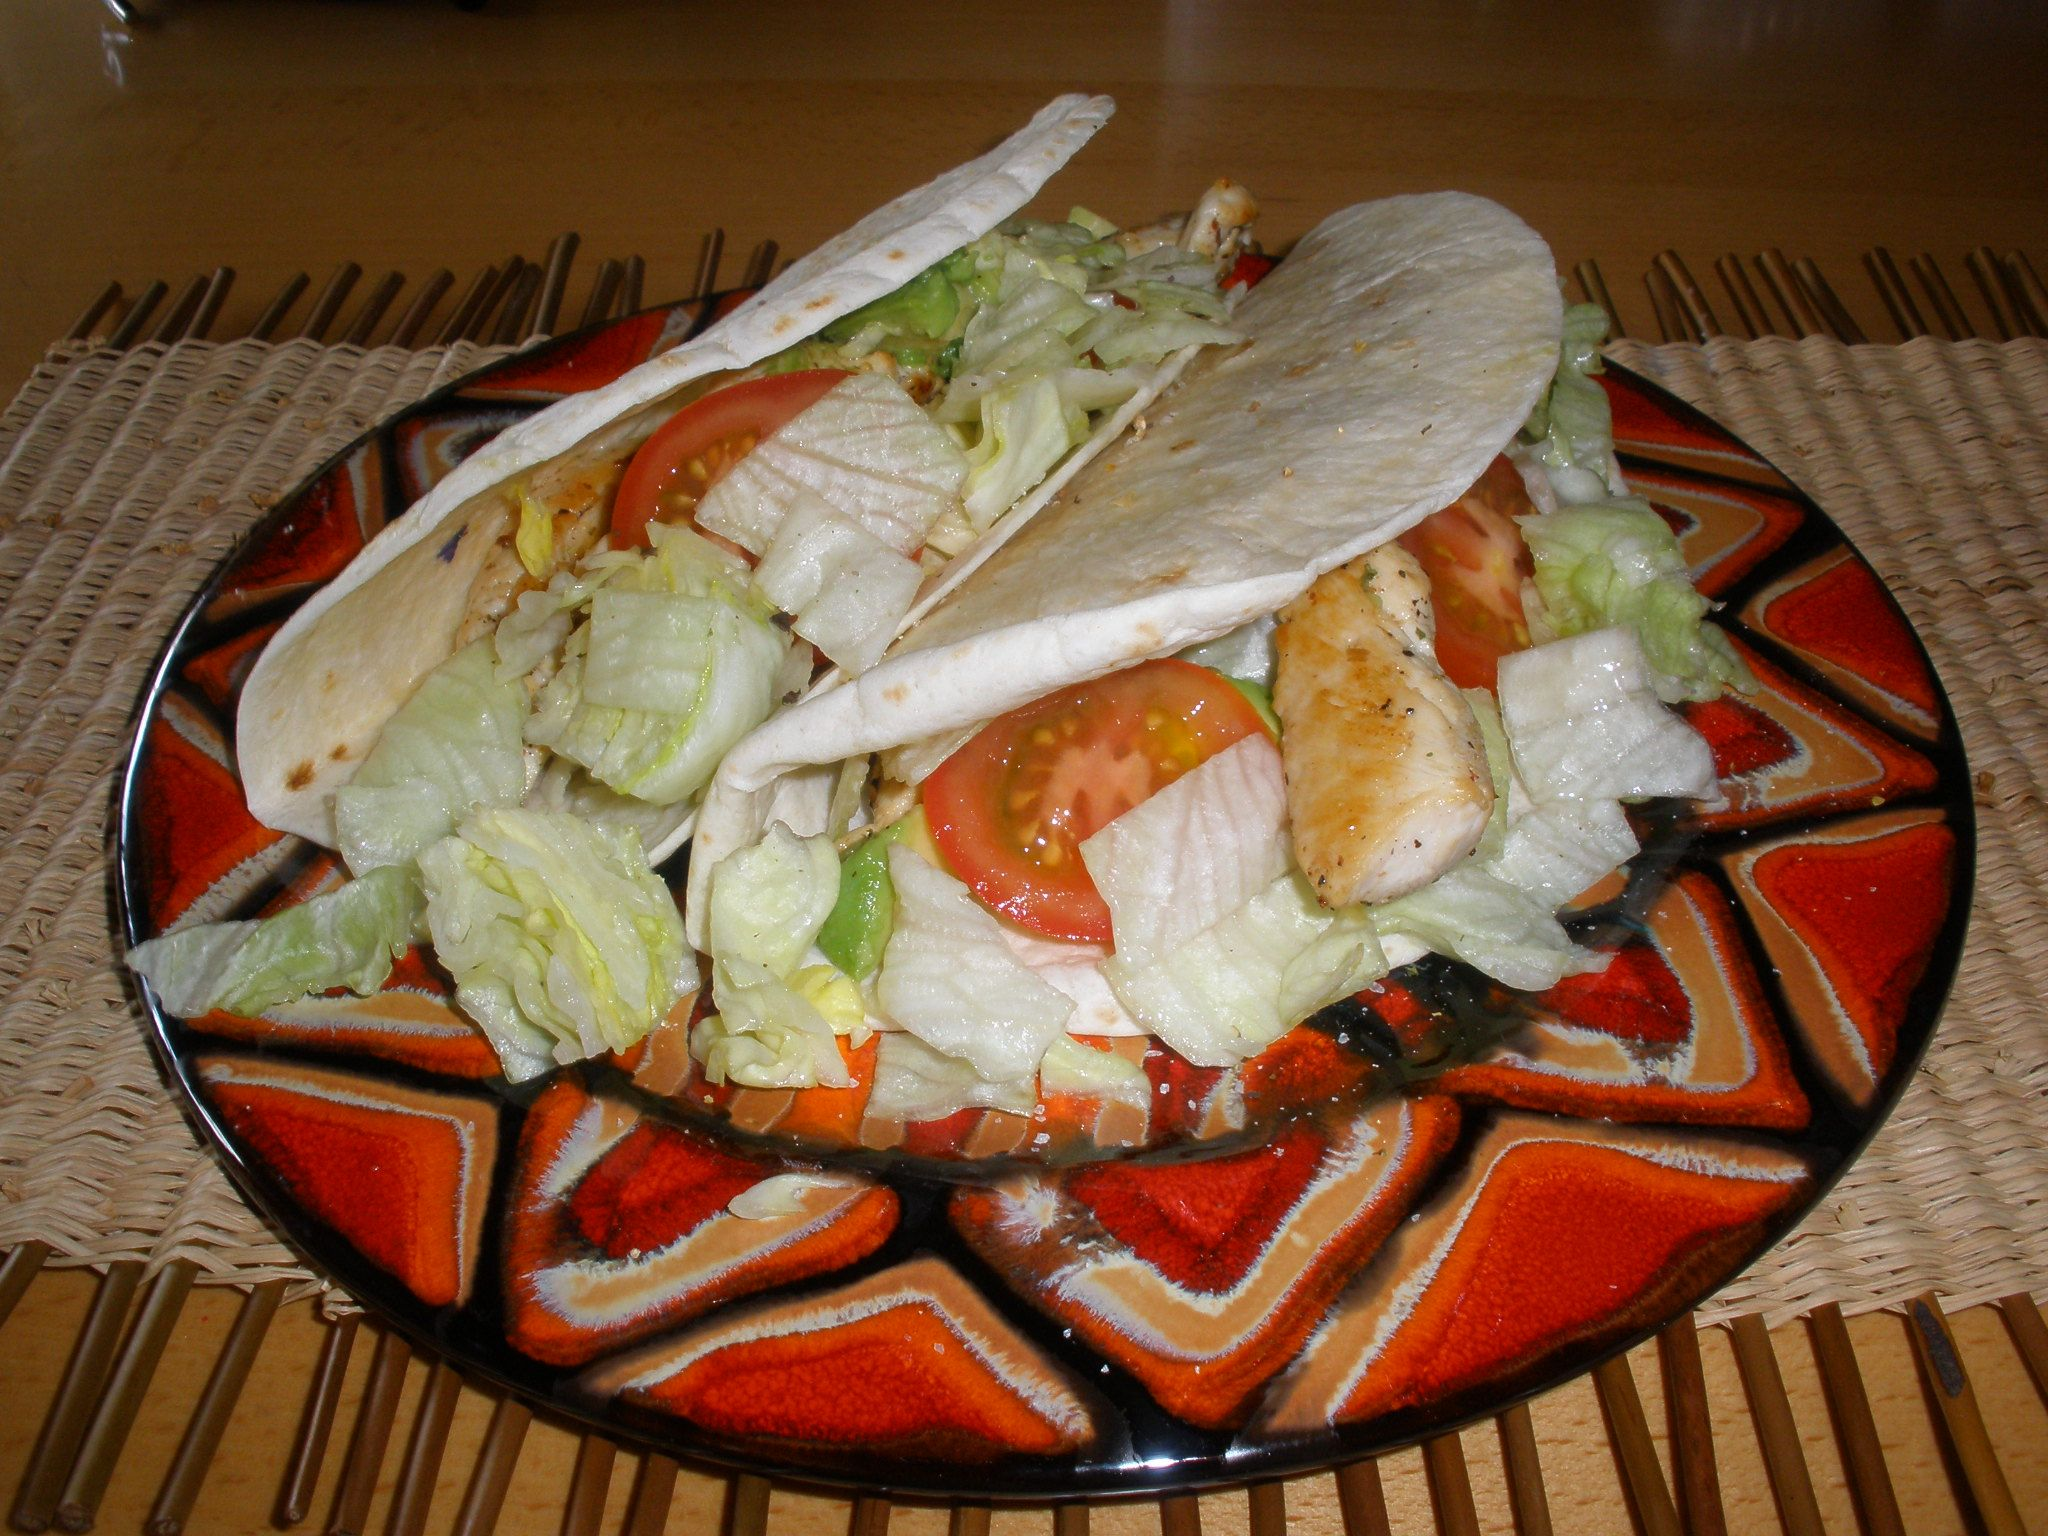 My mexican evening and delicious Chicken Fajita.